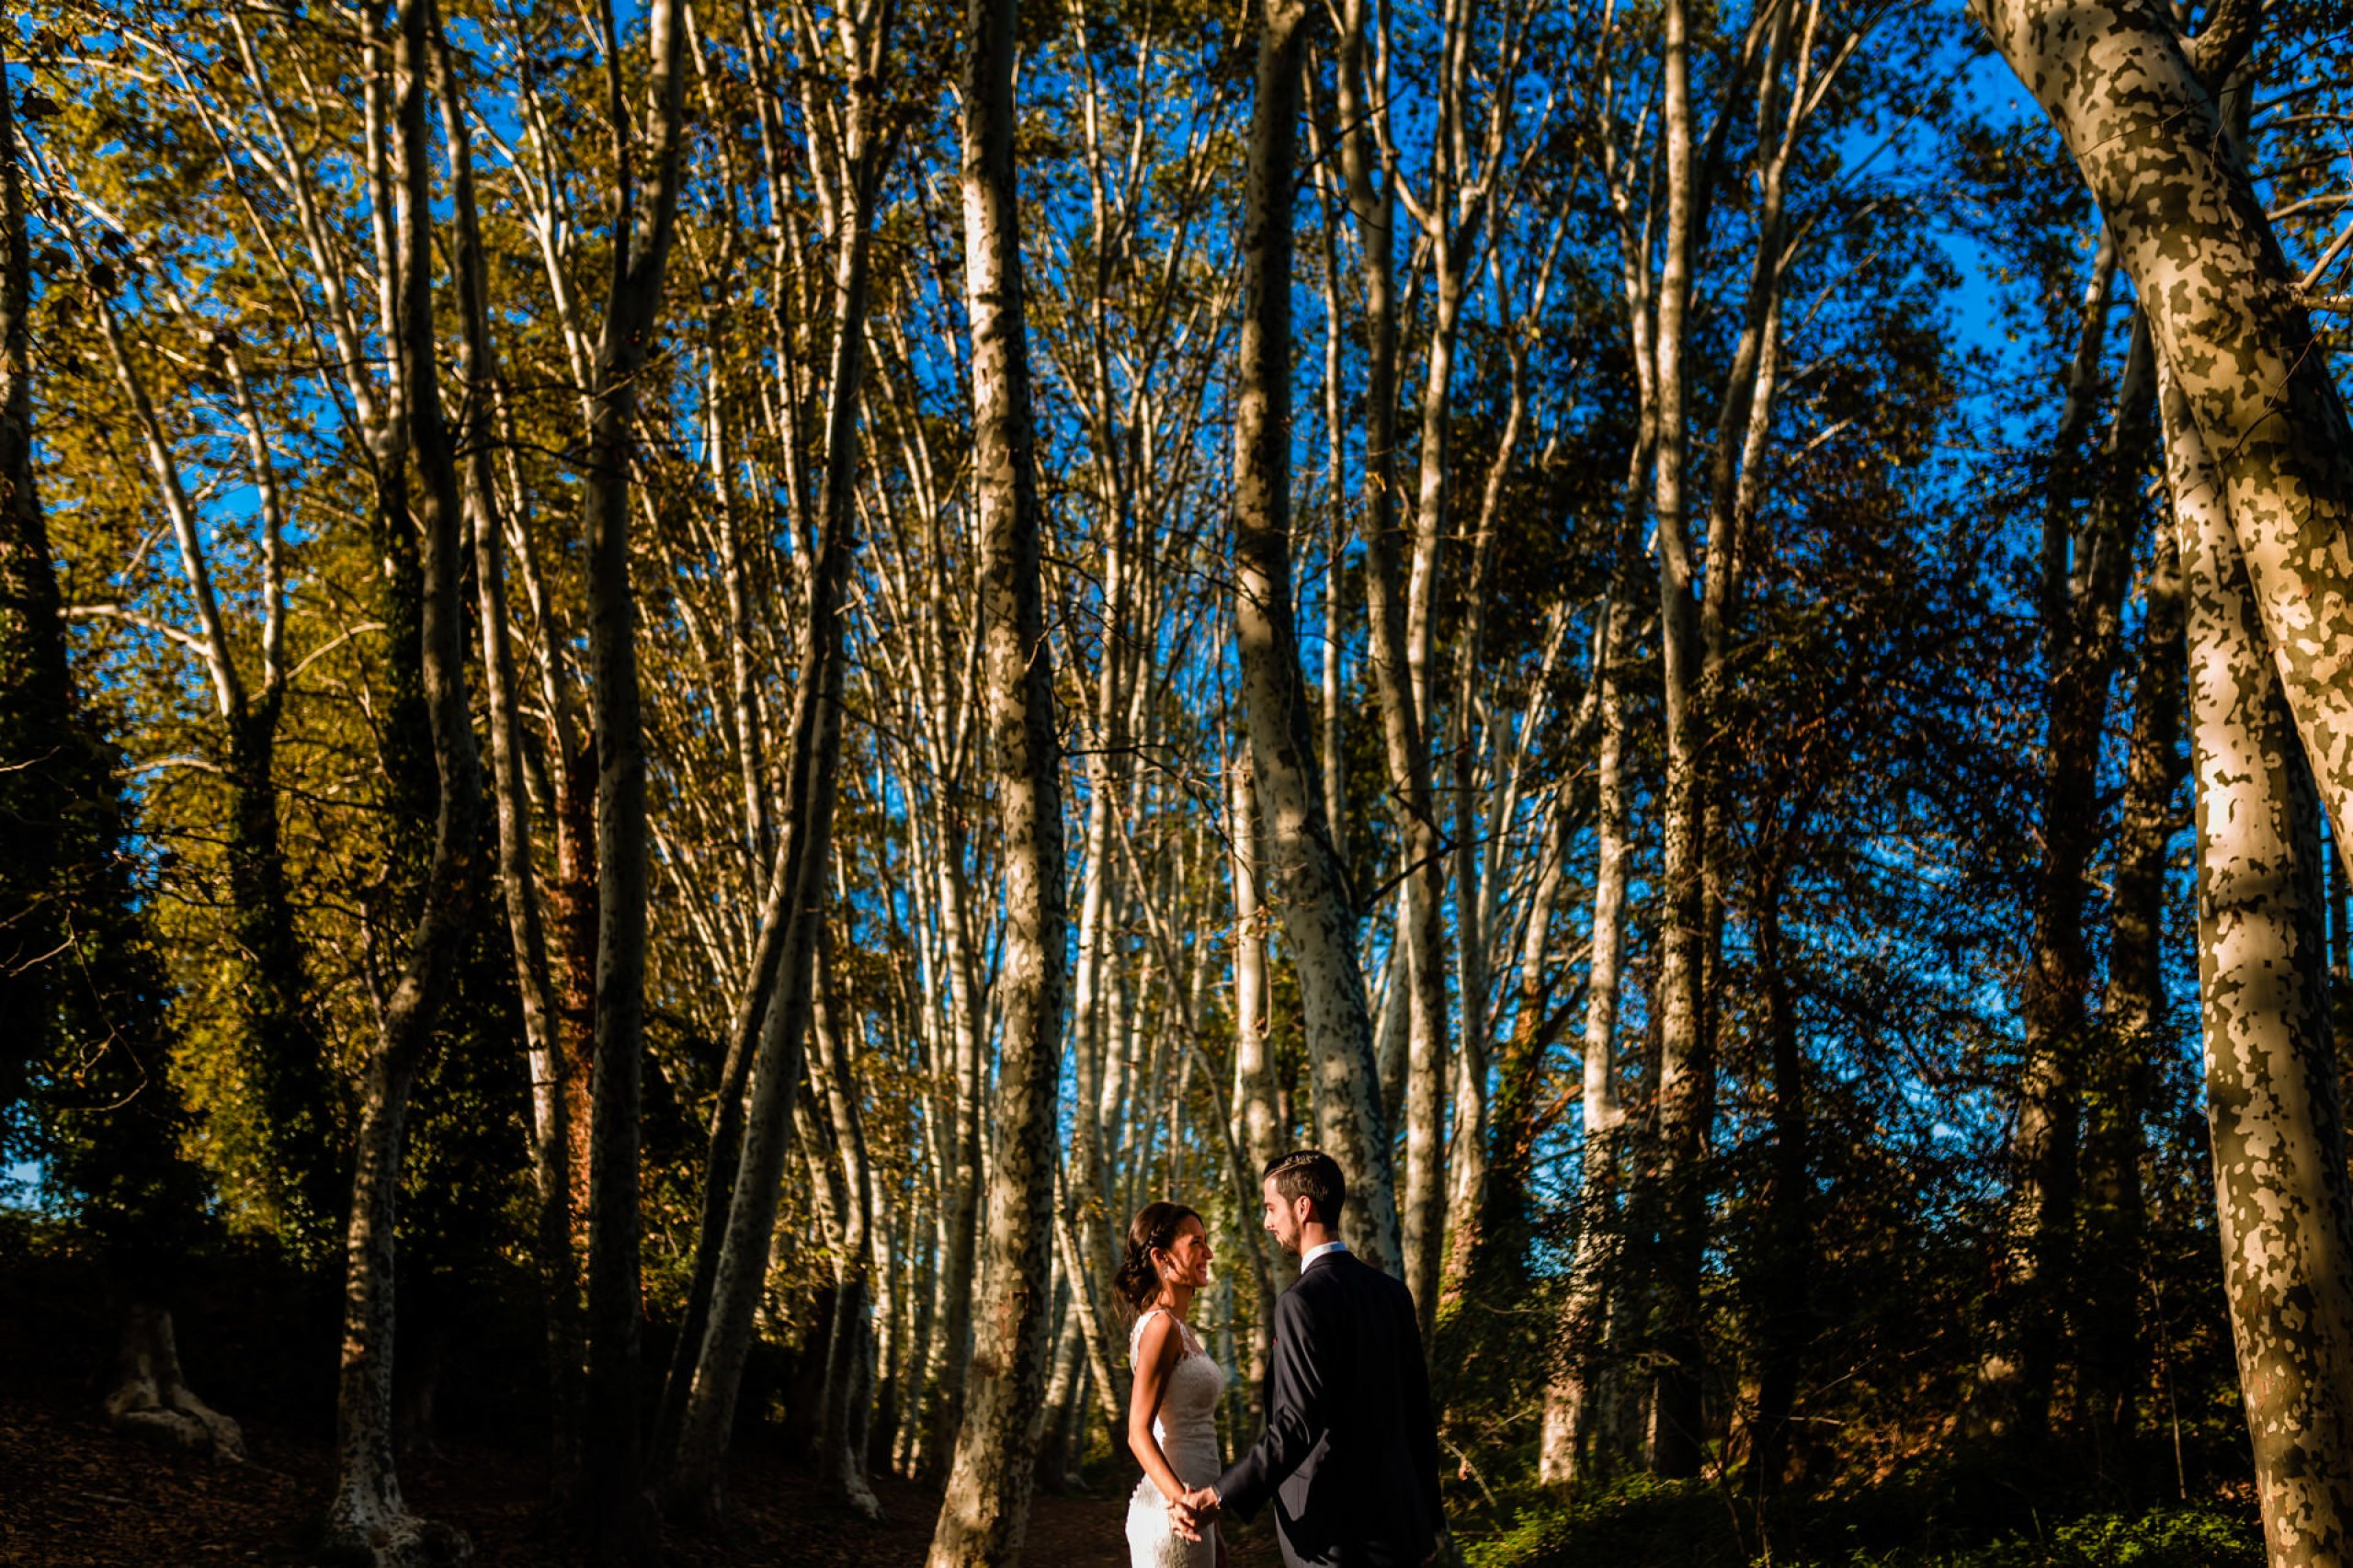 LuzdeBarcelona-postboda-boda-fotografo-cerdanyola-33